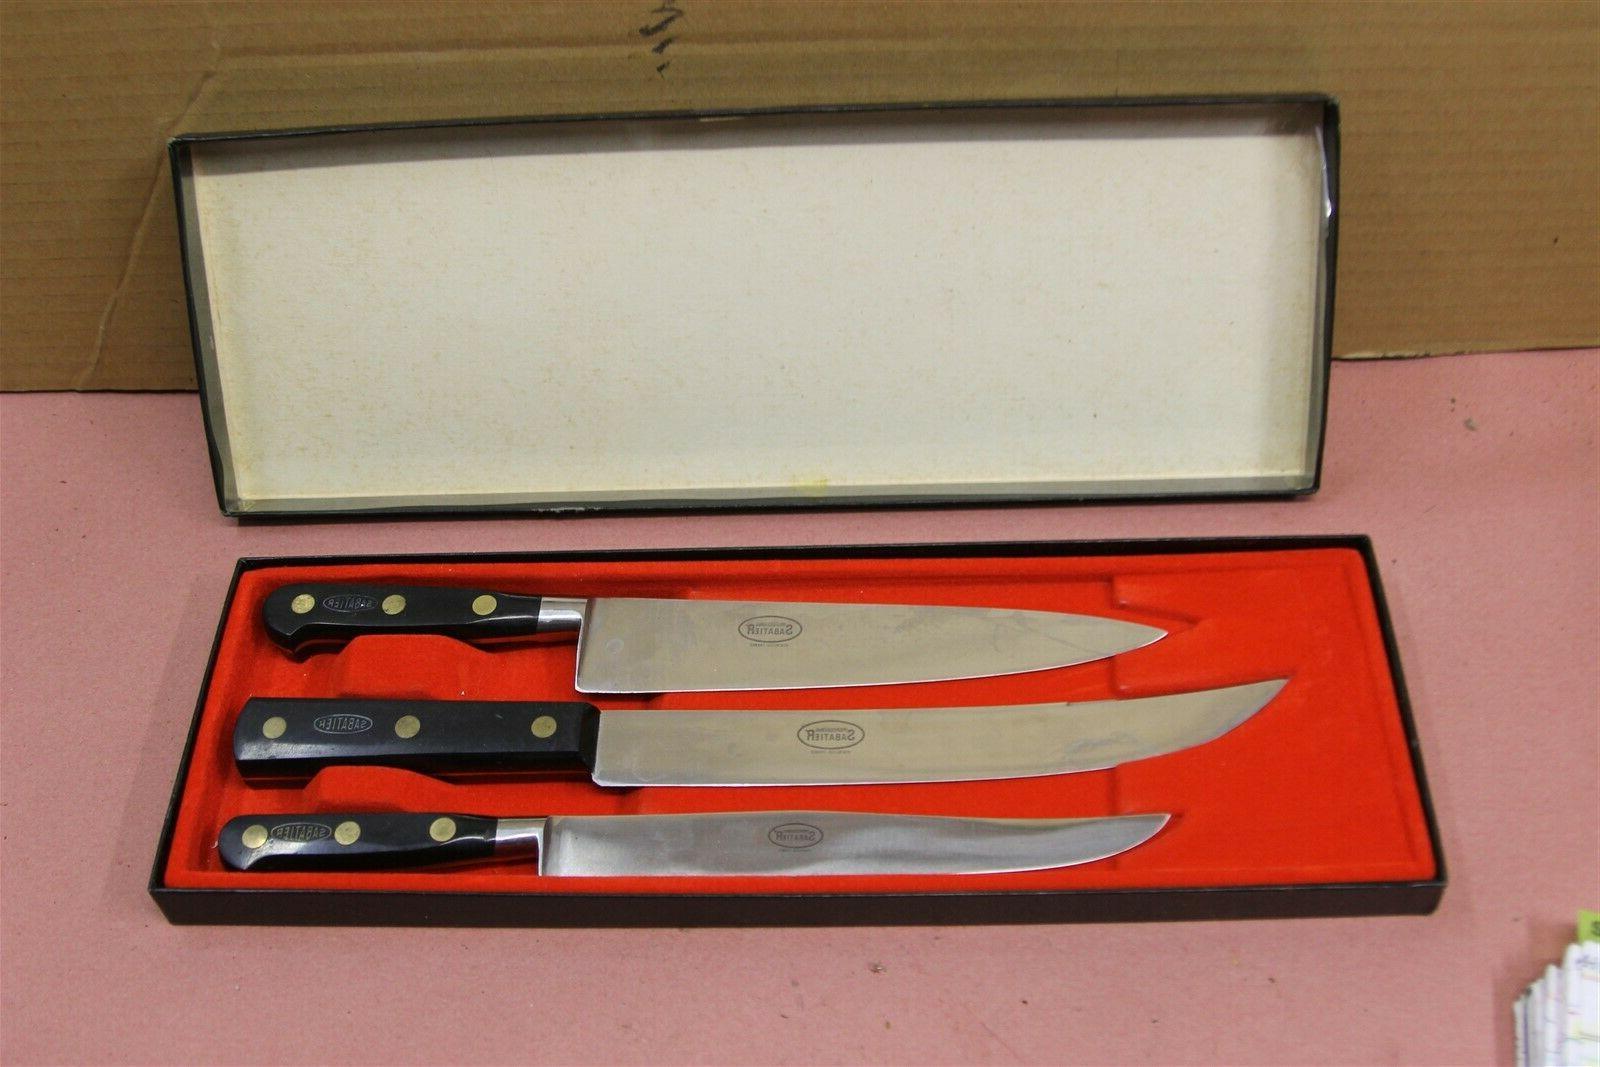 international chef knife set 3 piece set